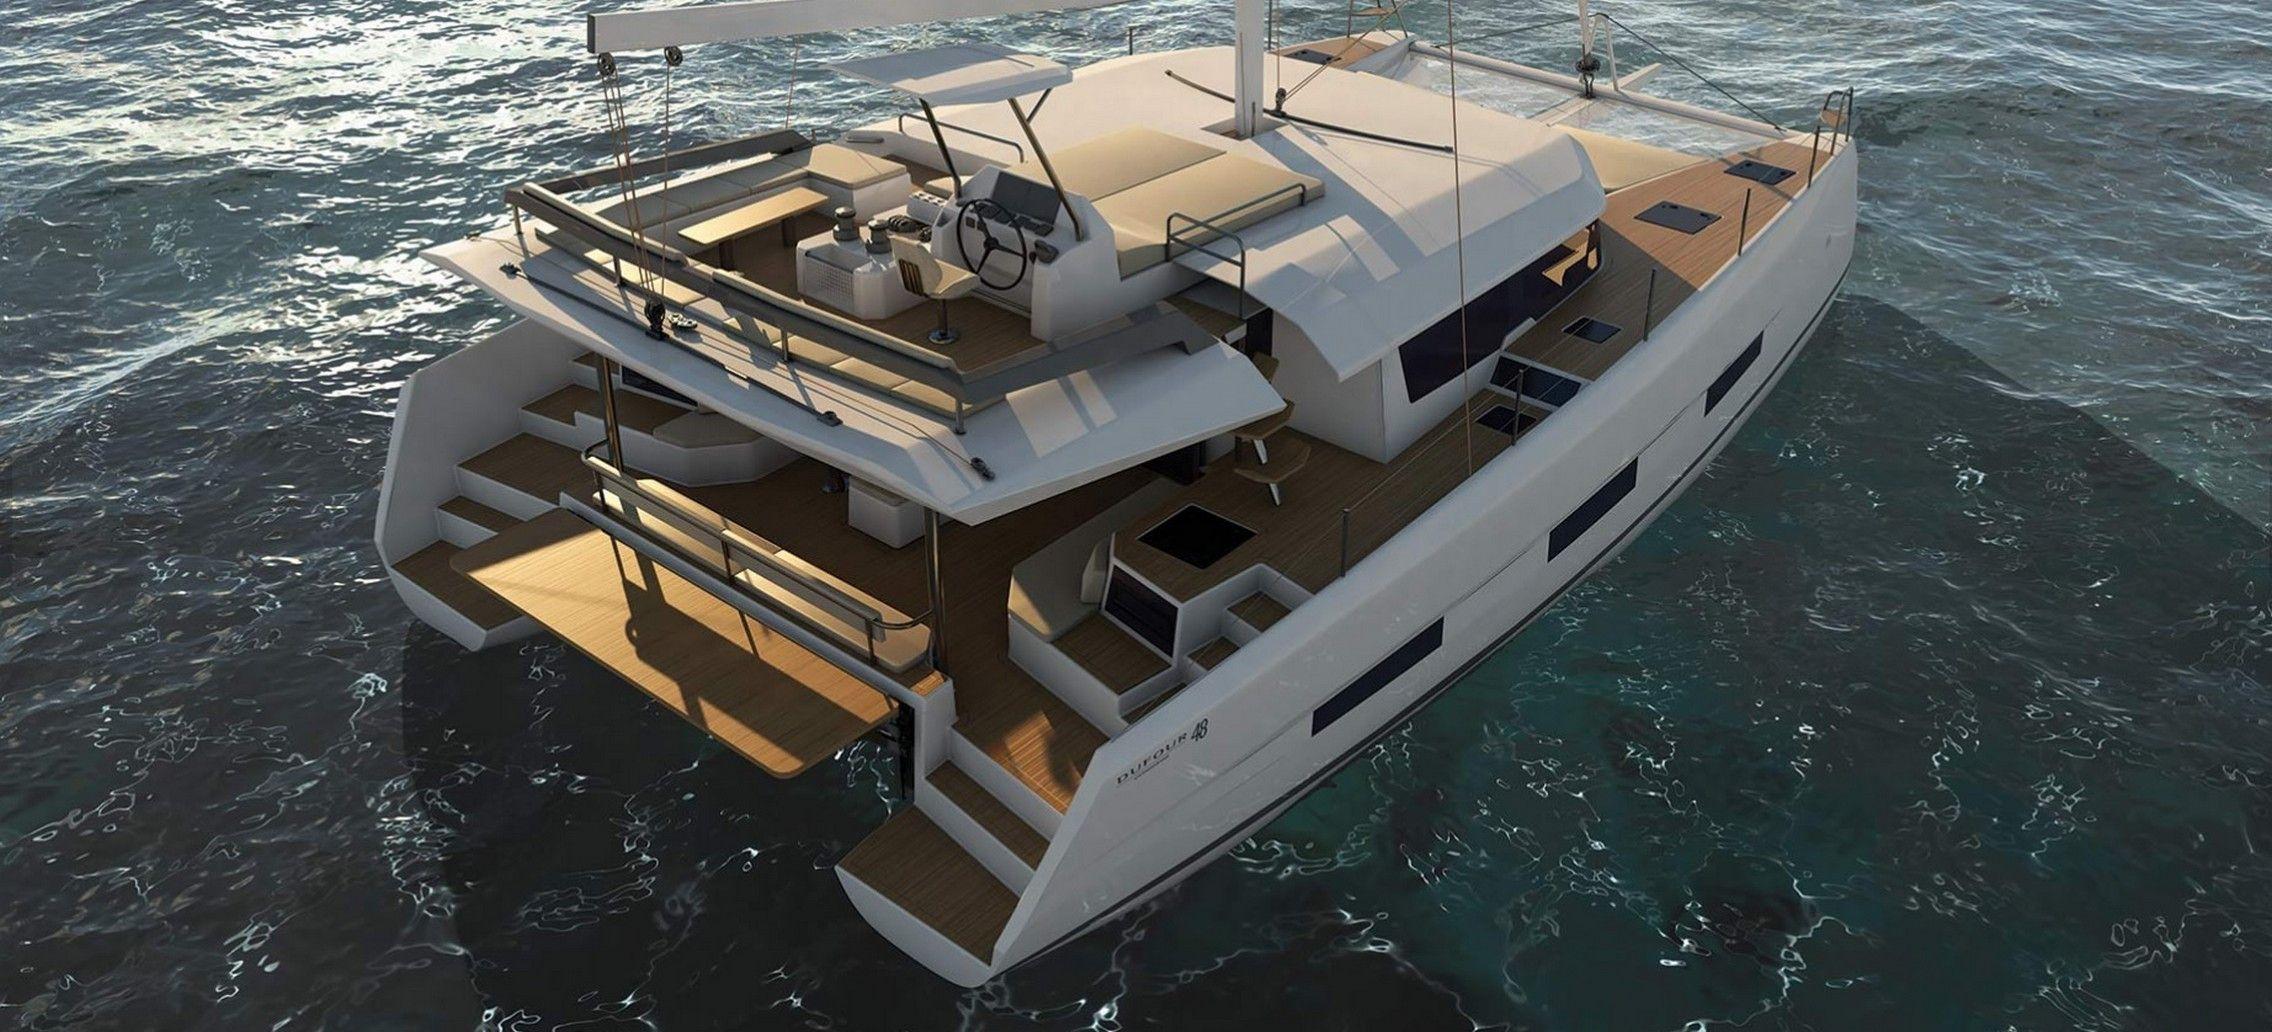 Dufour 48 - 2019 - 4 double + 1 twin cabin